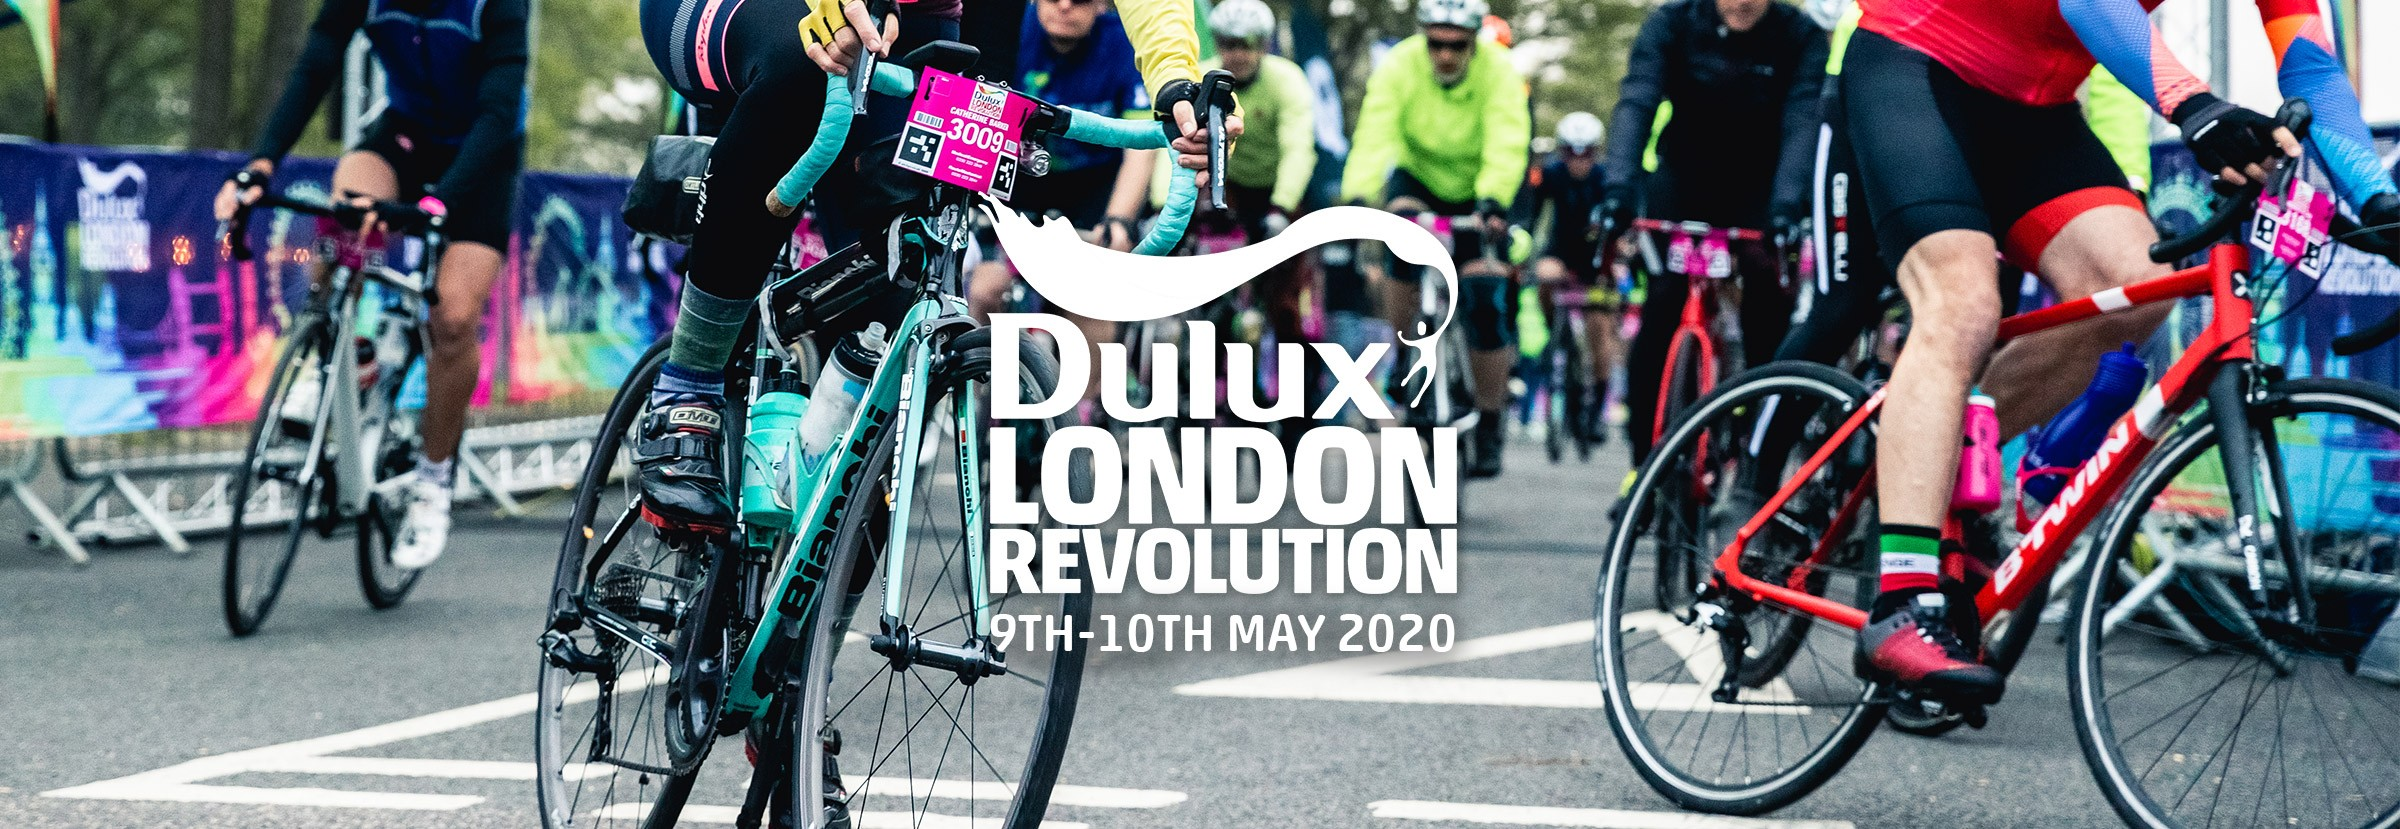 London Revolution